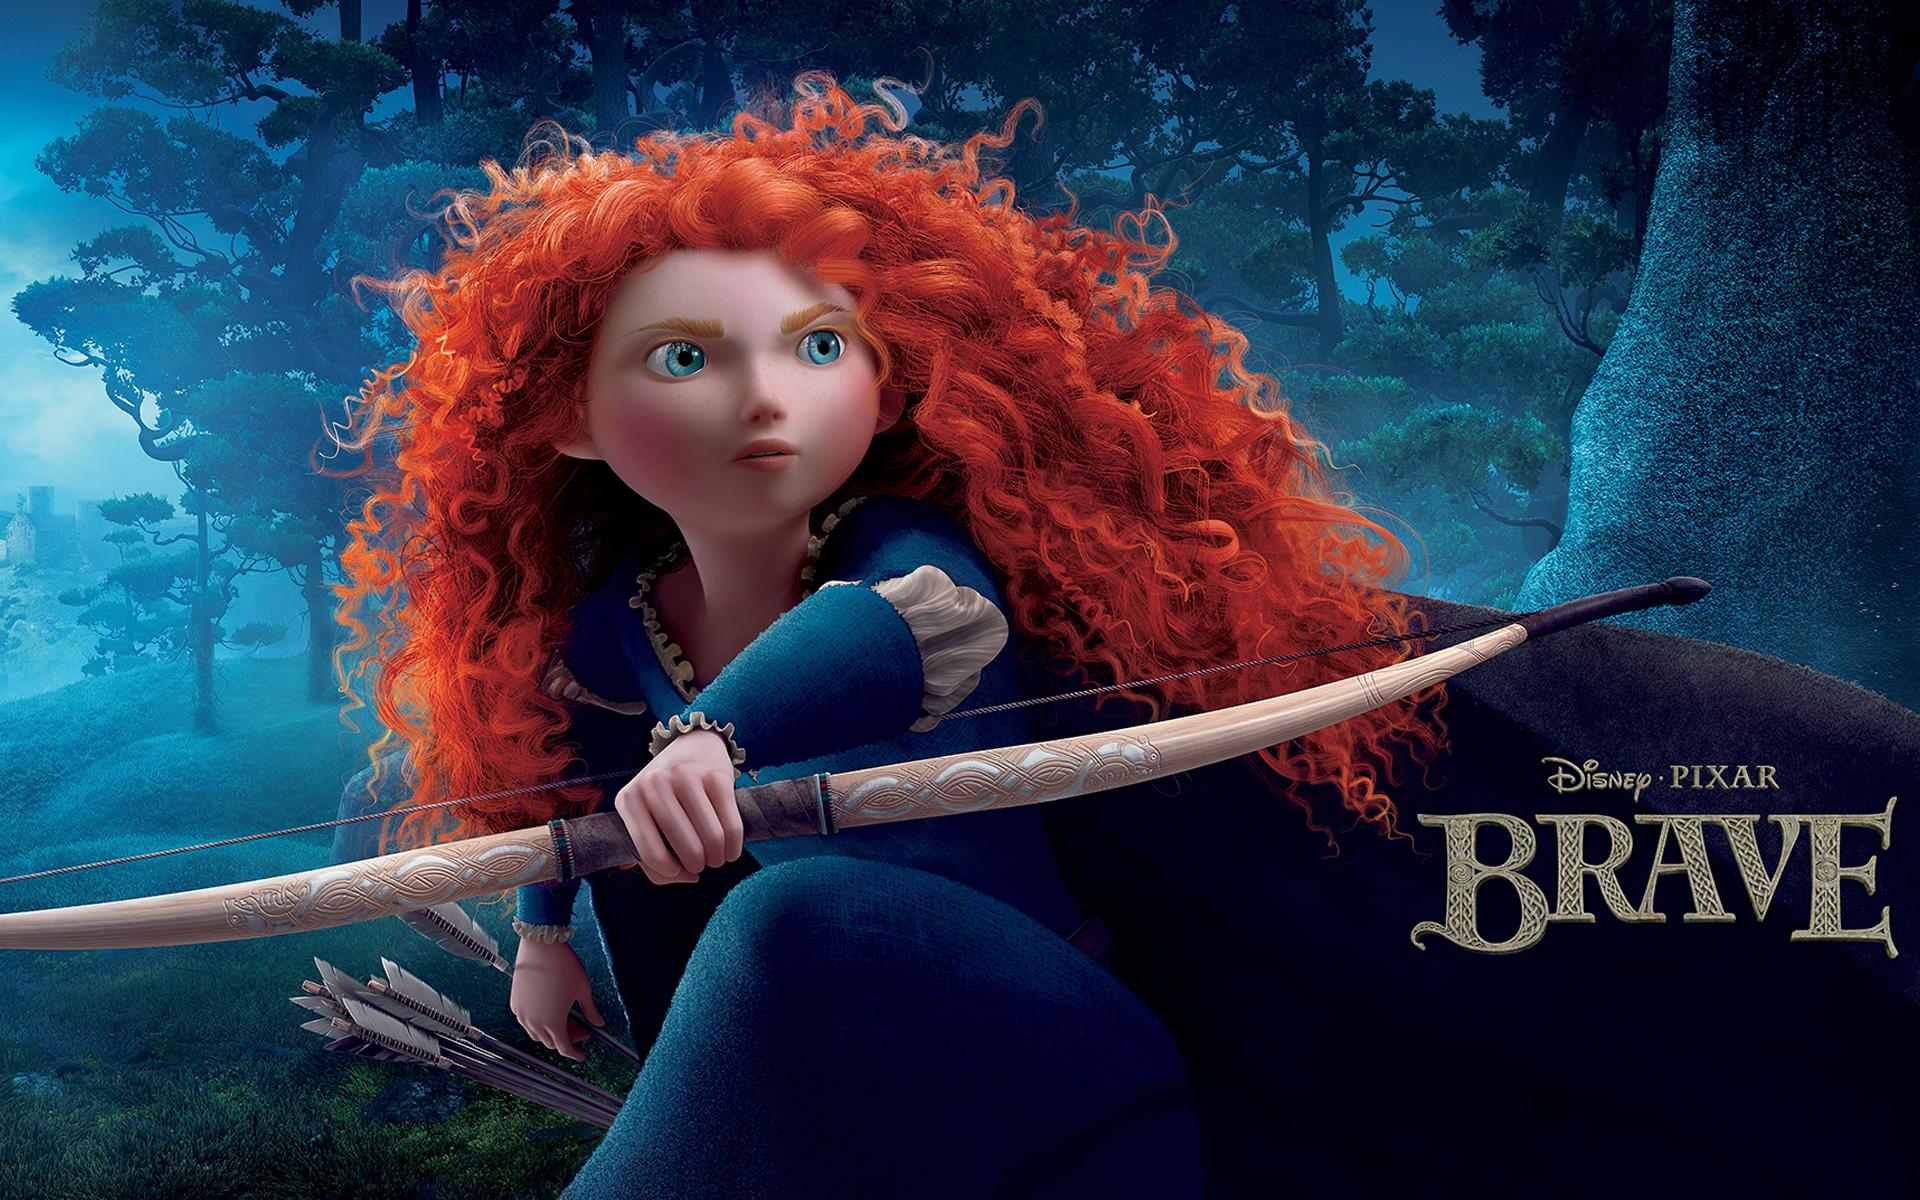 Disney Pixar Brave Wallpapers HD Wallpapers 1920x1200